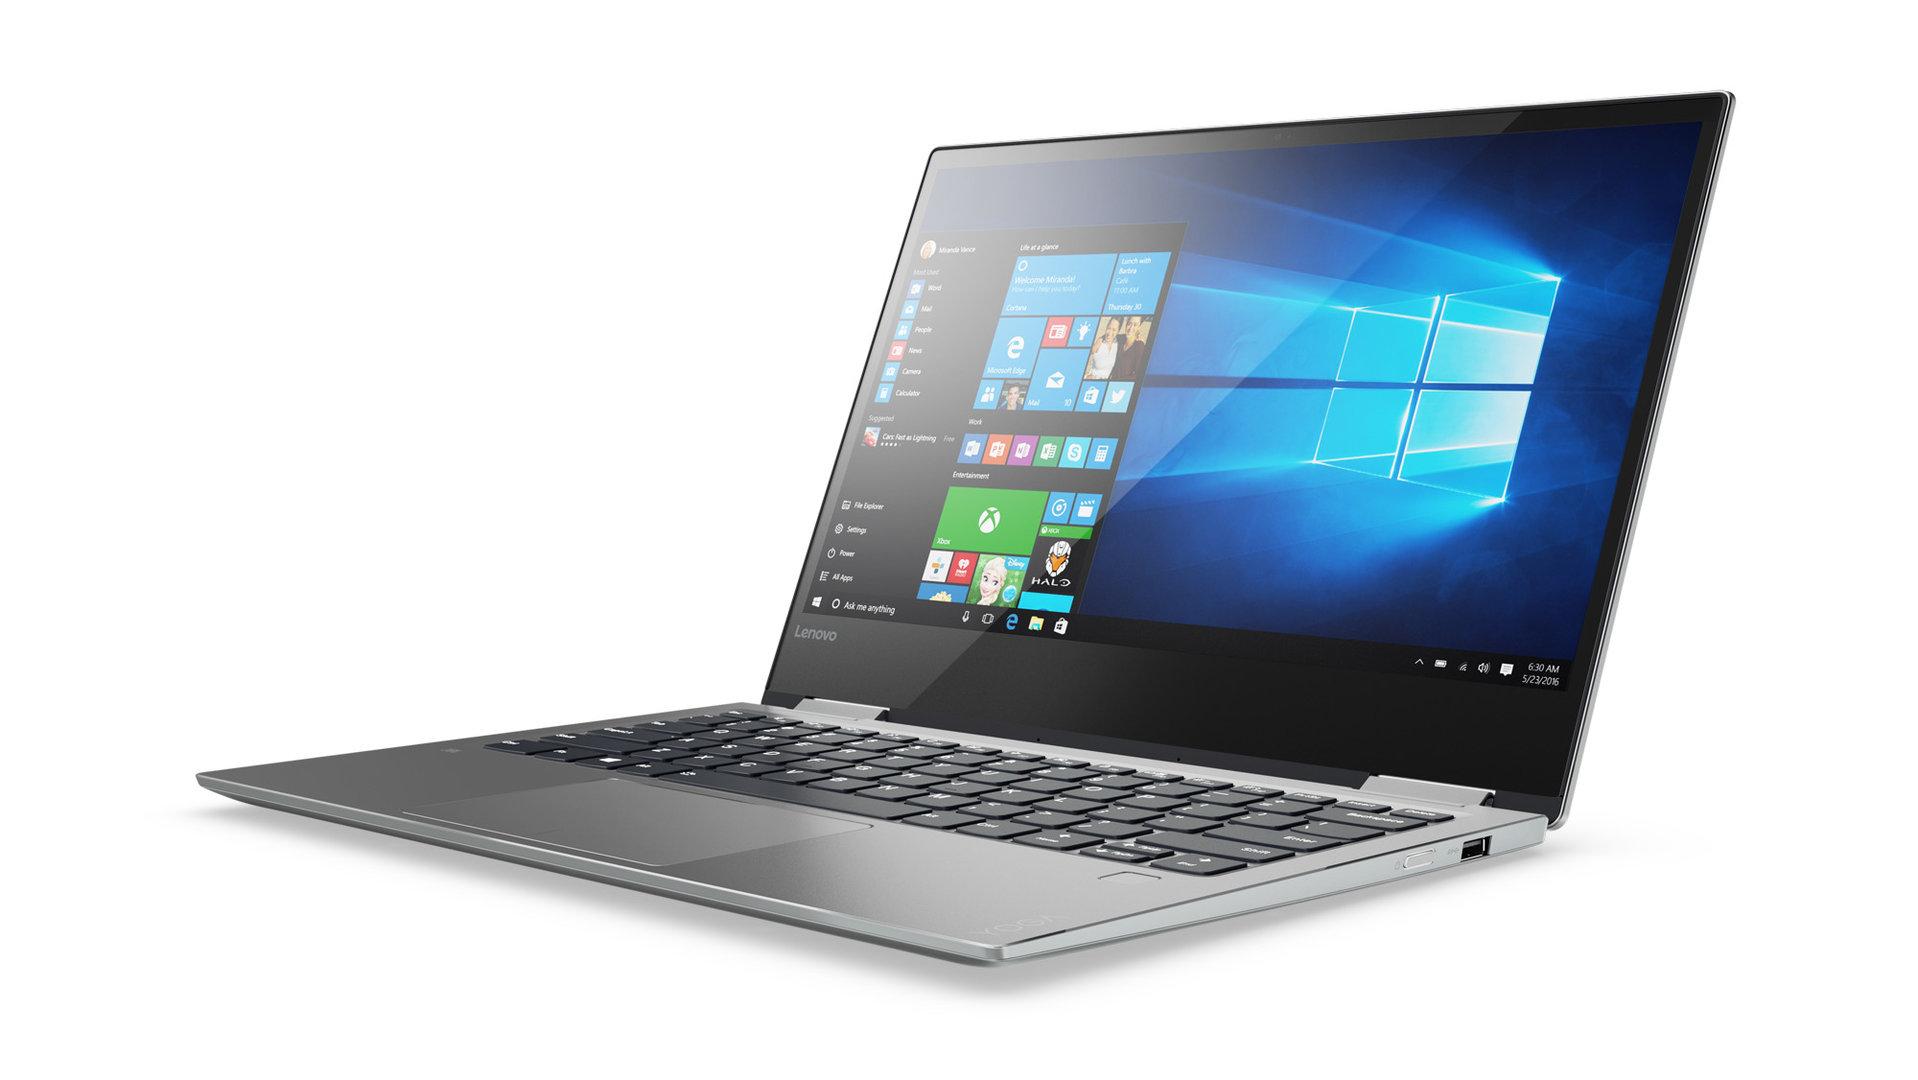 Lenovo Yoga 720 (13 Zoll) in Silber